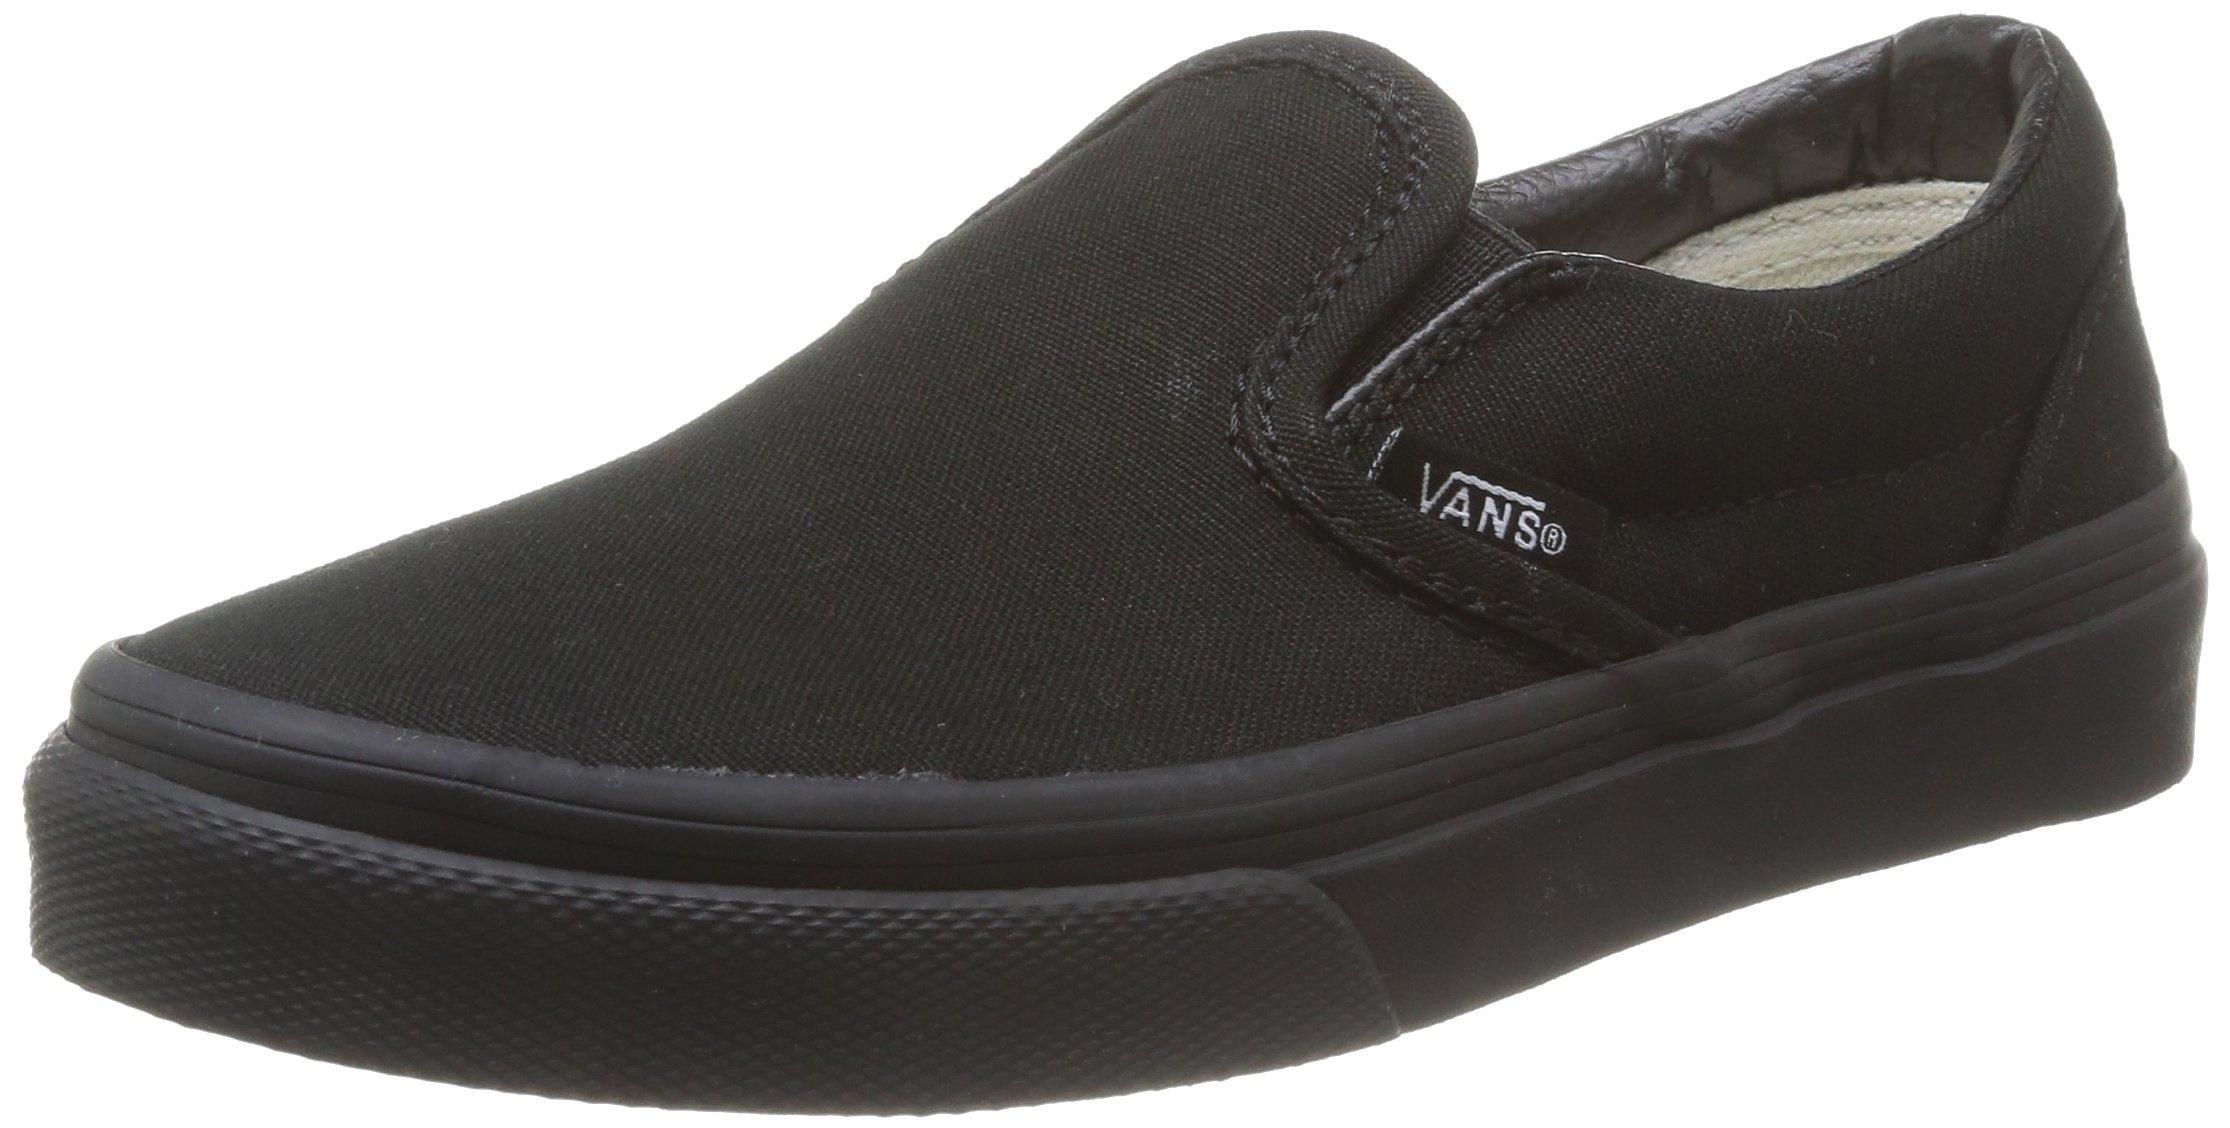 a69471dbfc2 Galleon - Vans K Classic Slip-ON All Black Size 1.5